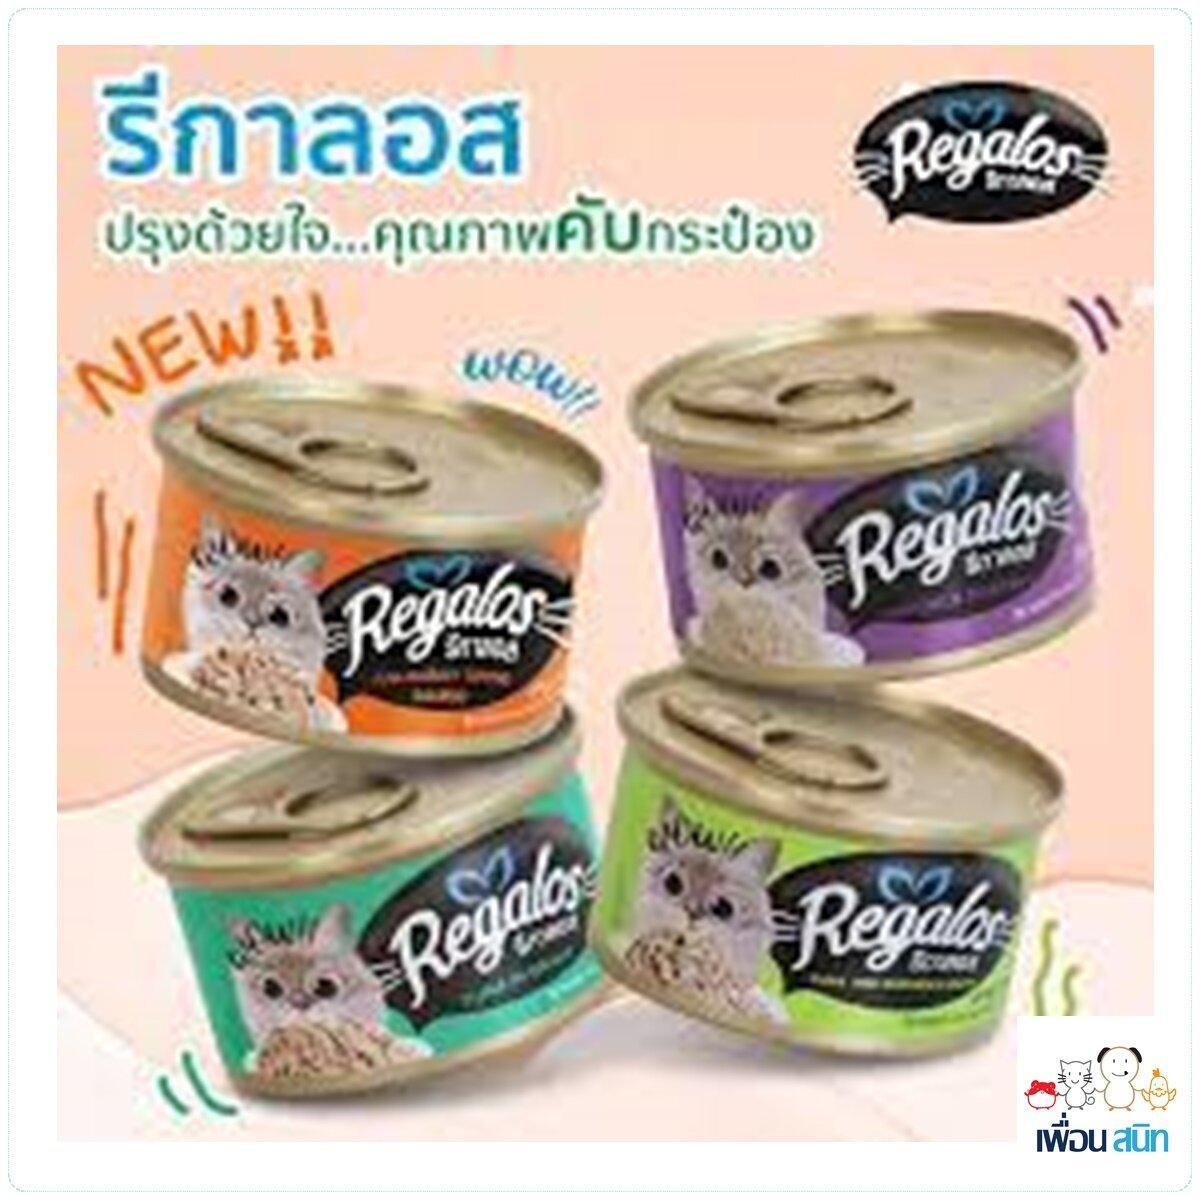 Regalos รีกาลอส อาหารแมวกระป๋อง ขนาด 80 กรัม มี 6 รสชาติ.